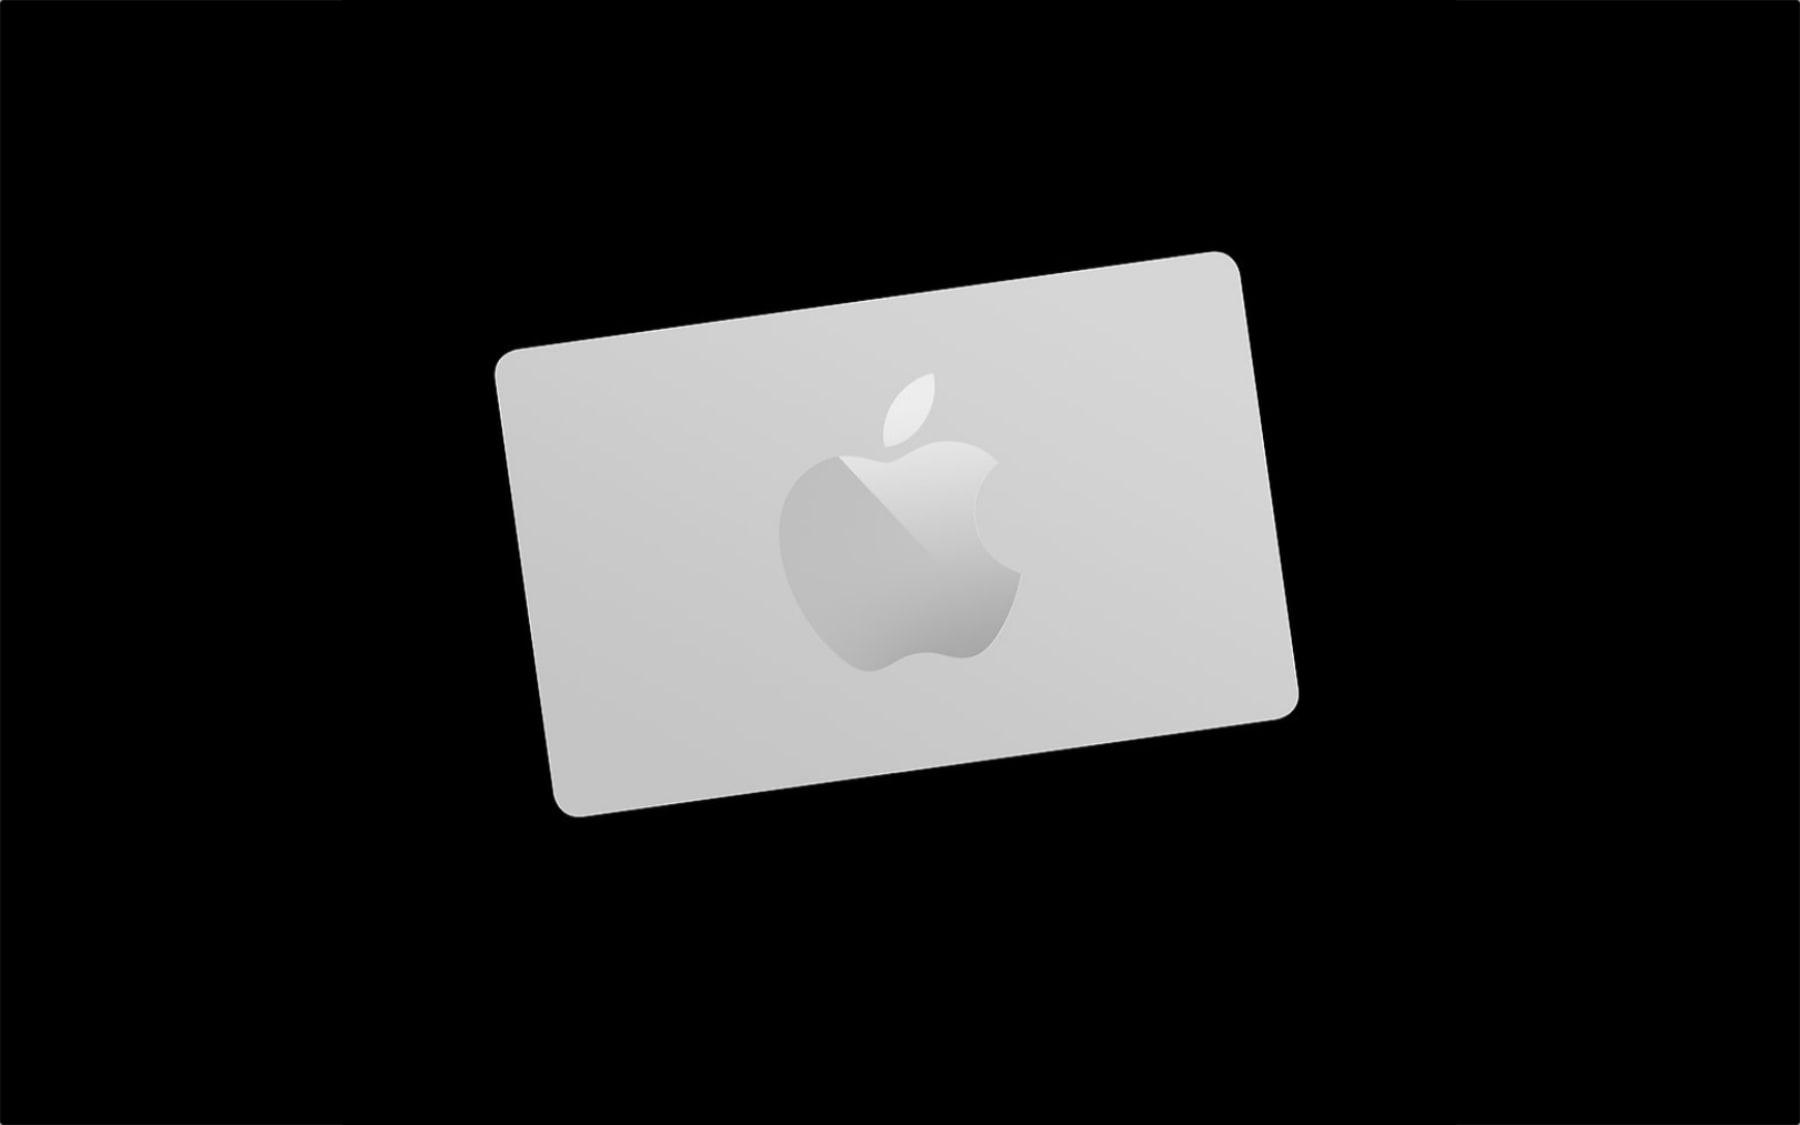 Apple Black Friday Cyber Monday 2020 Sale